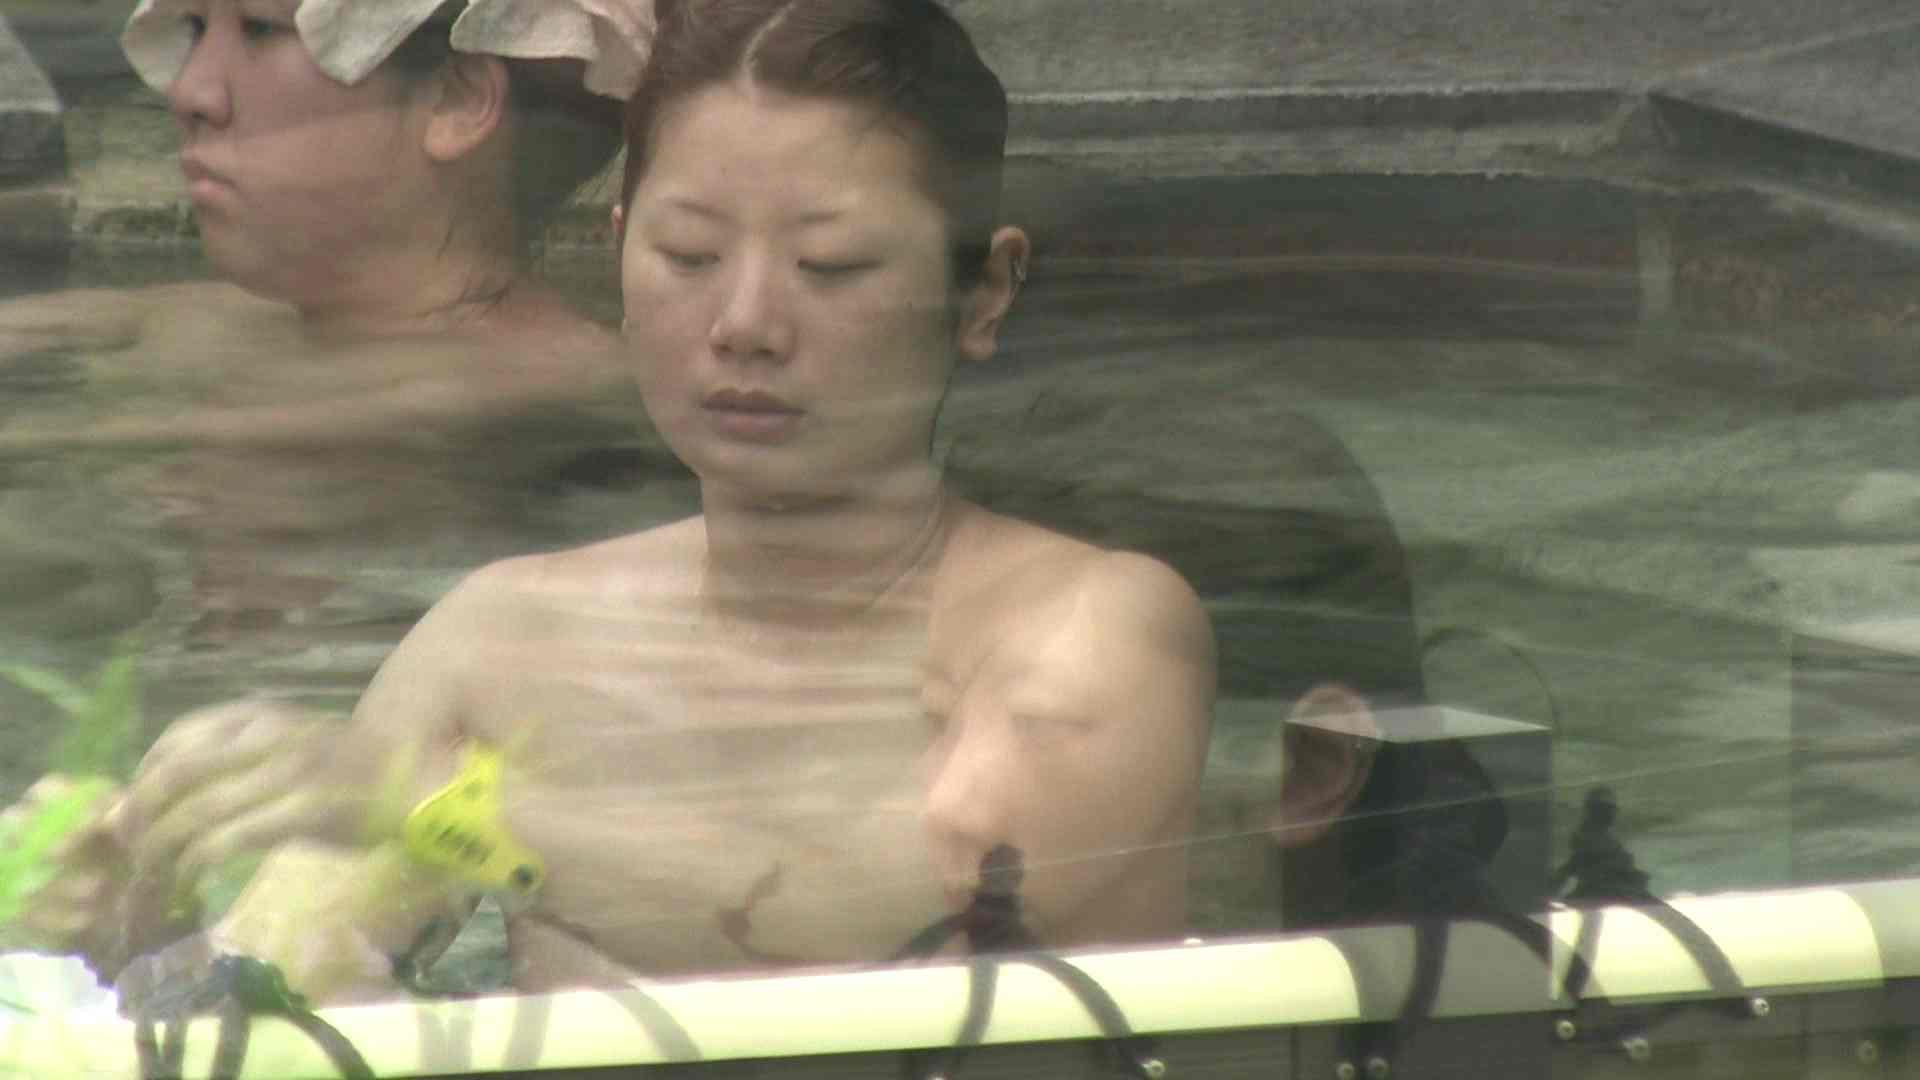 Aquaな露天風呂Vol.19【VIP】 盗撮 | HなOL  88pic 88